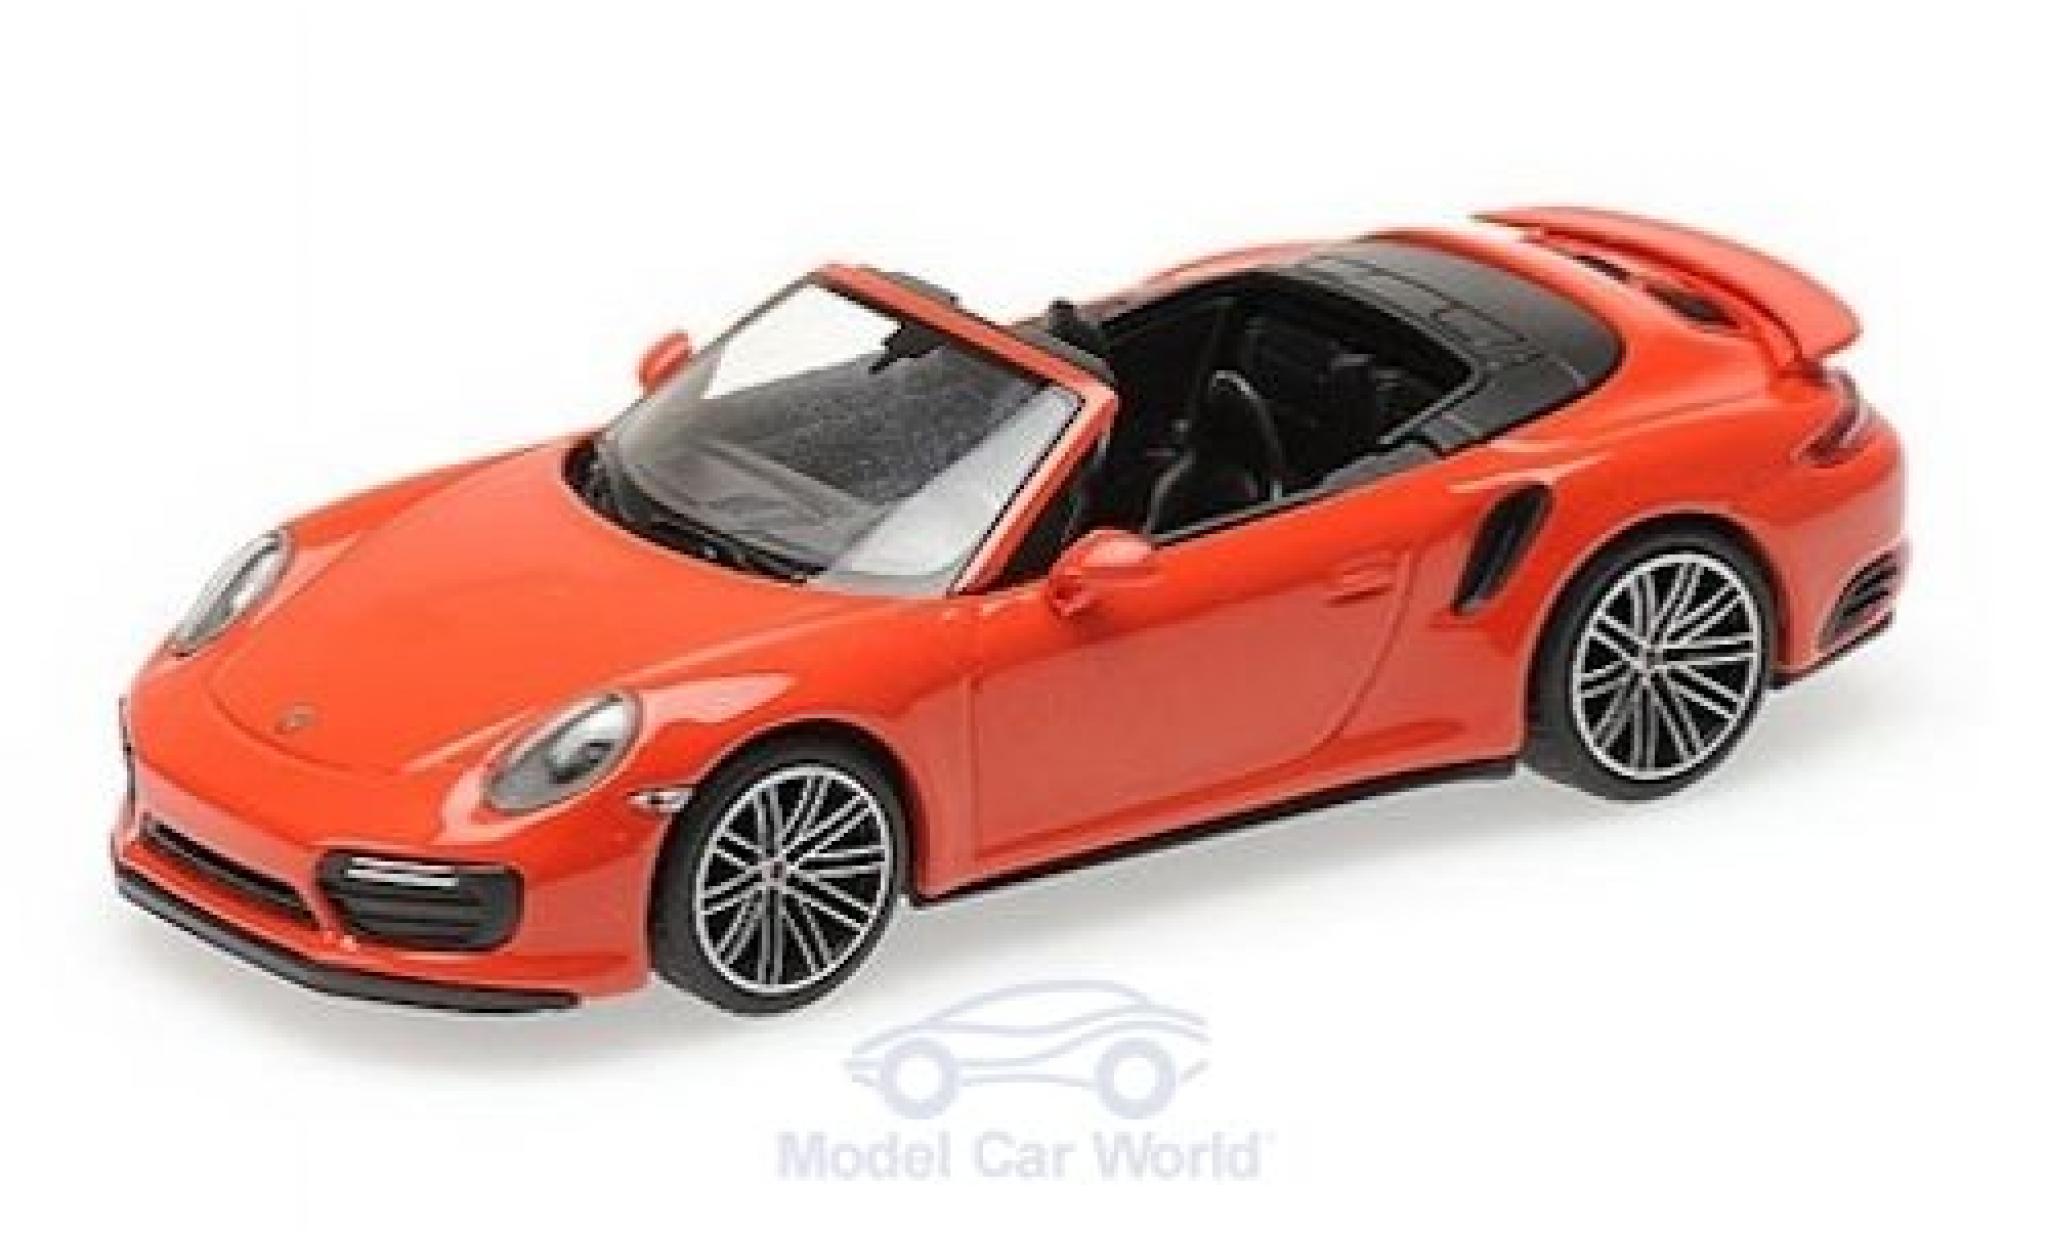 Porsche 911 1/43 Minichamps (991.2) Turbo S Cabriolet orange 2016